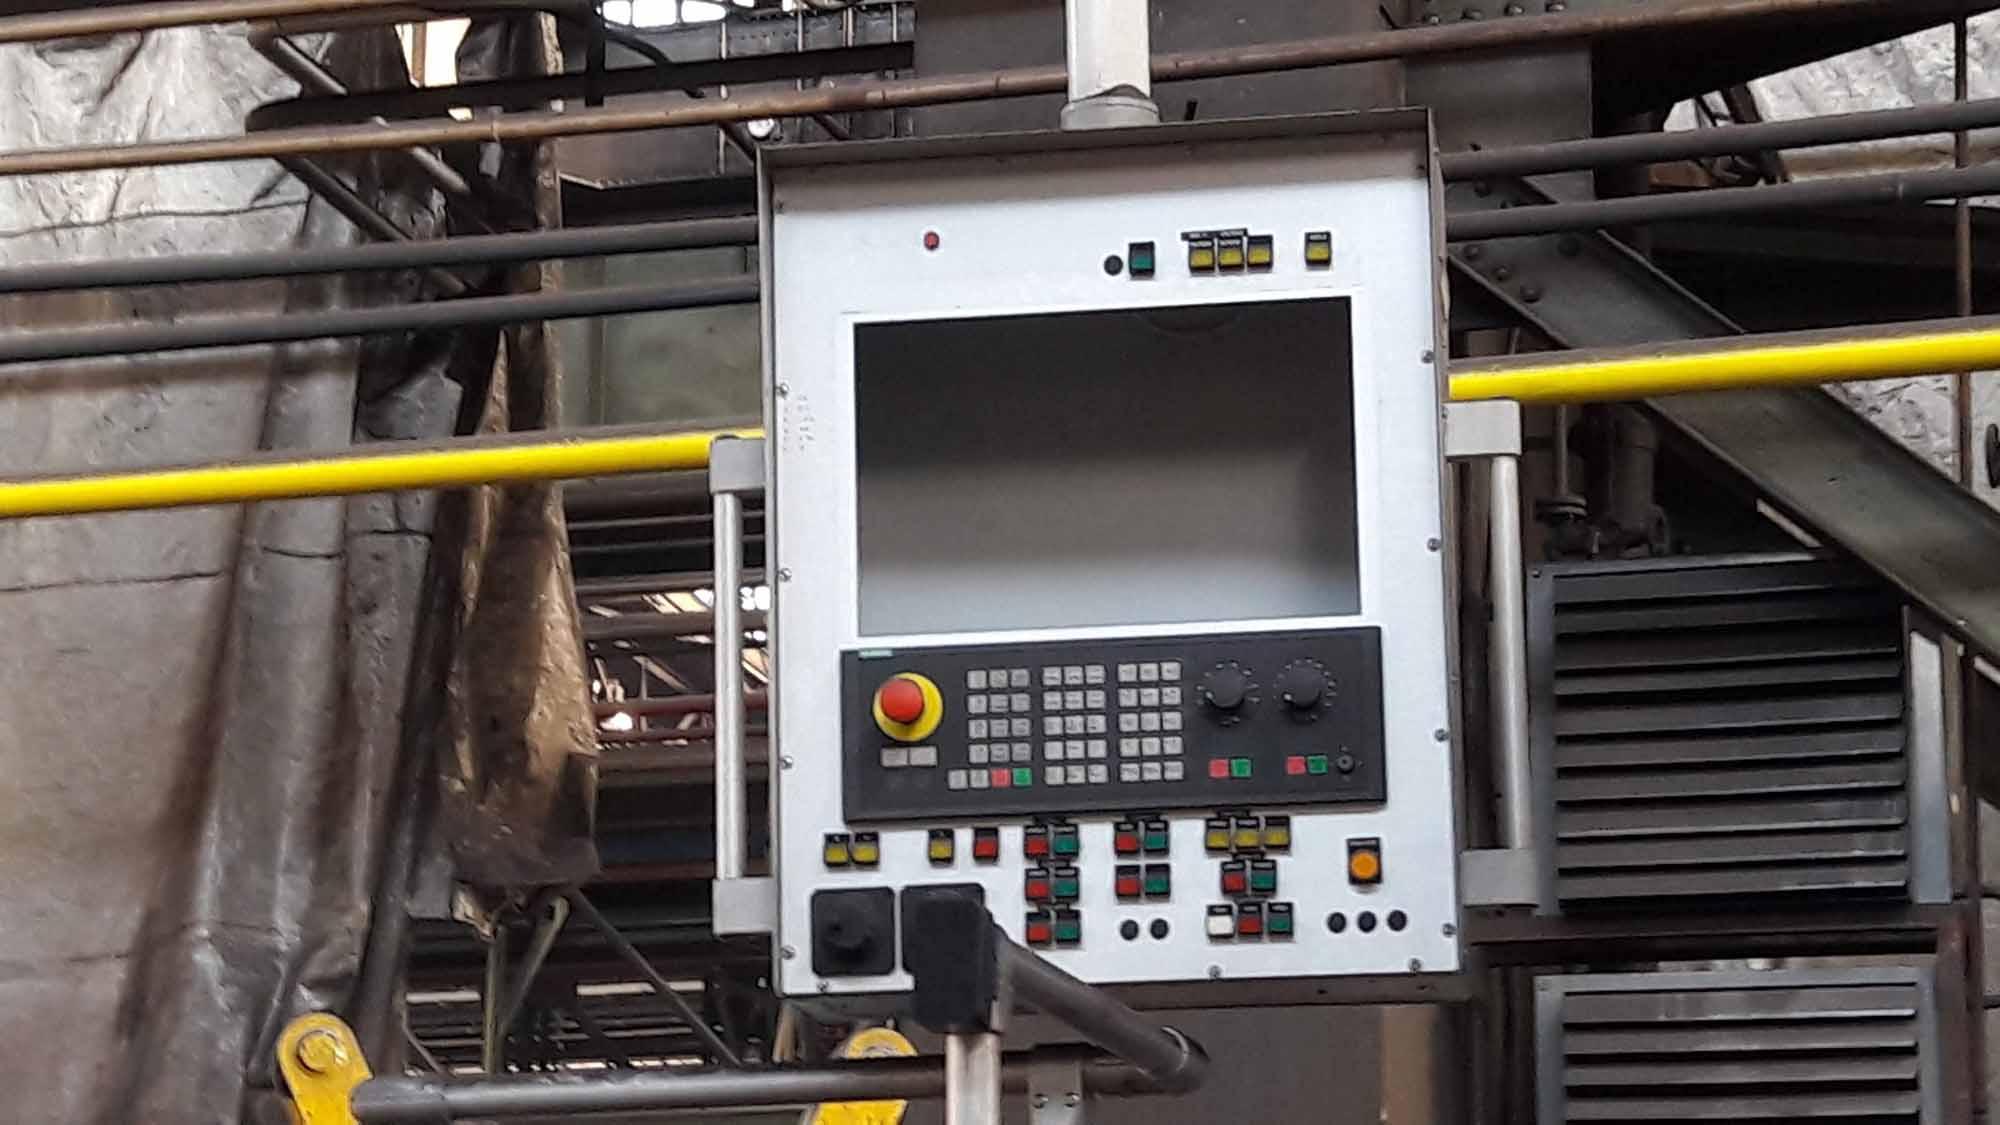 5350-rafamet crankshaft mill.06